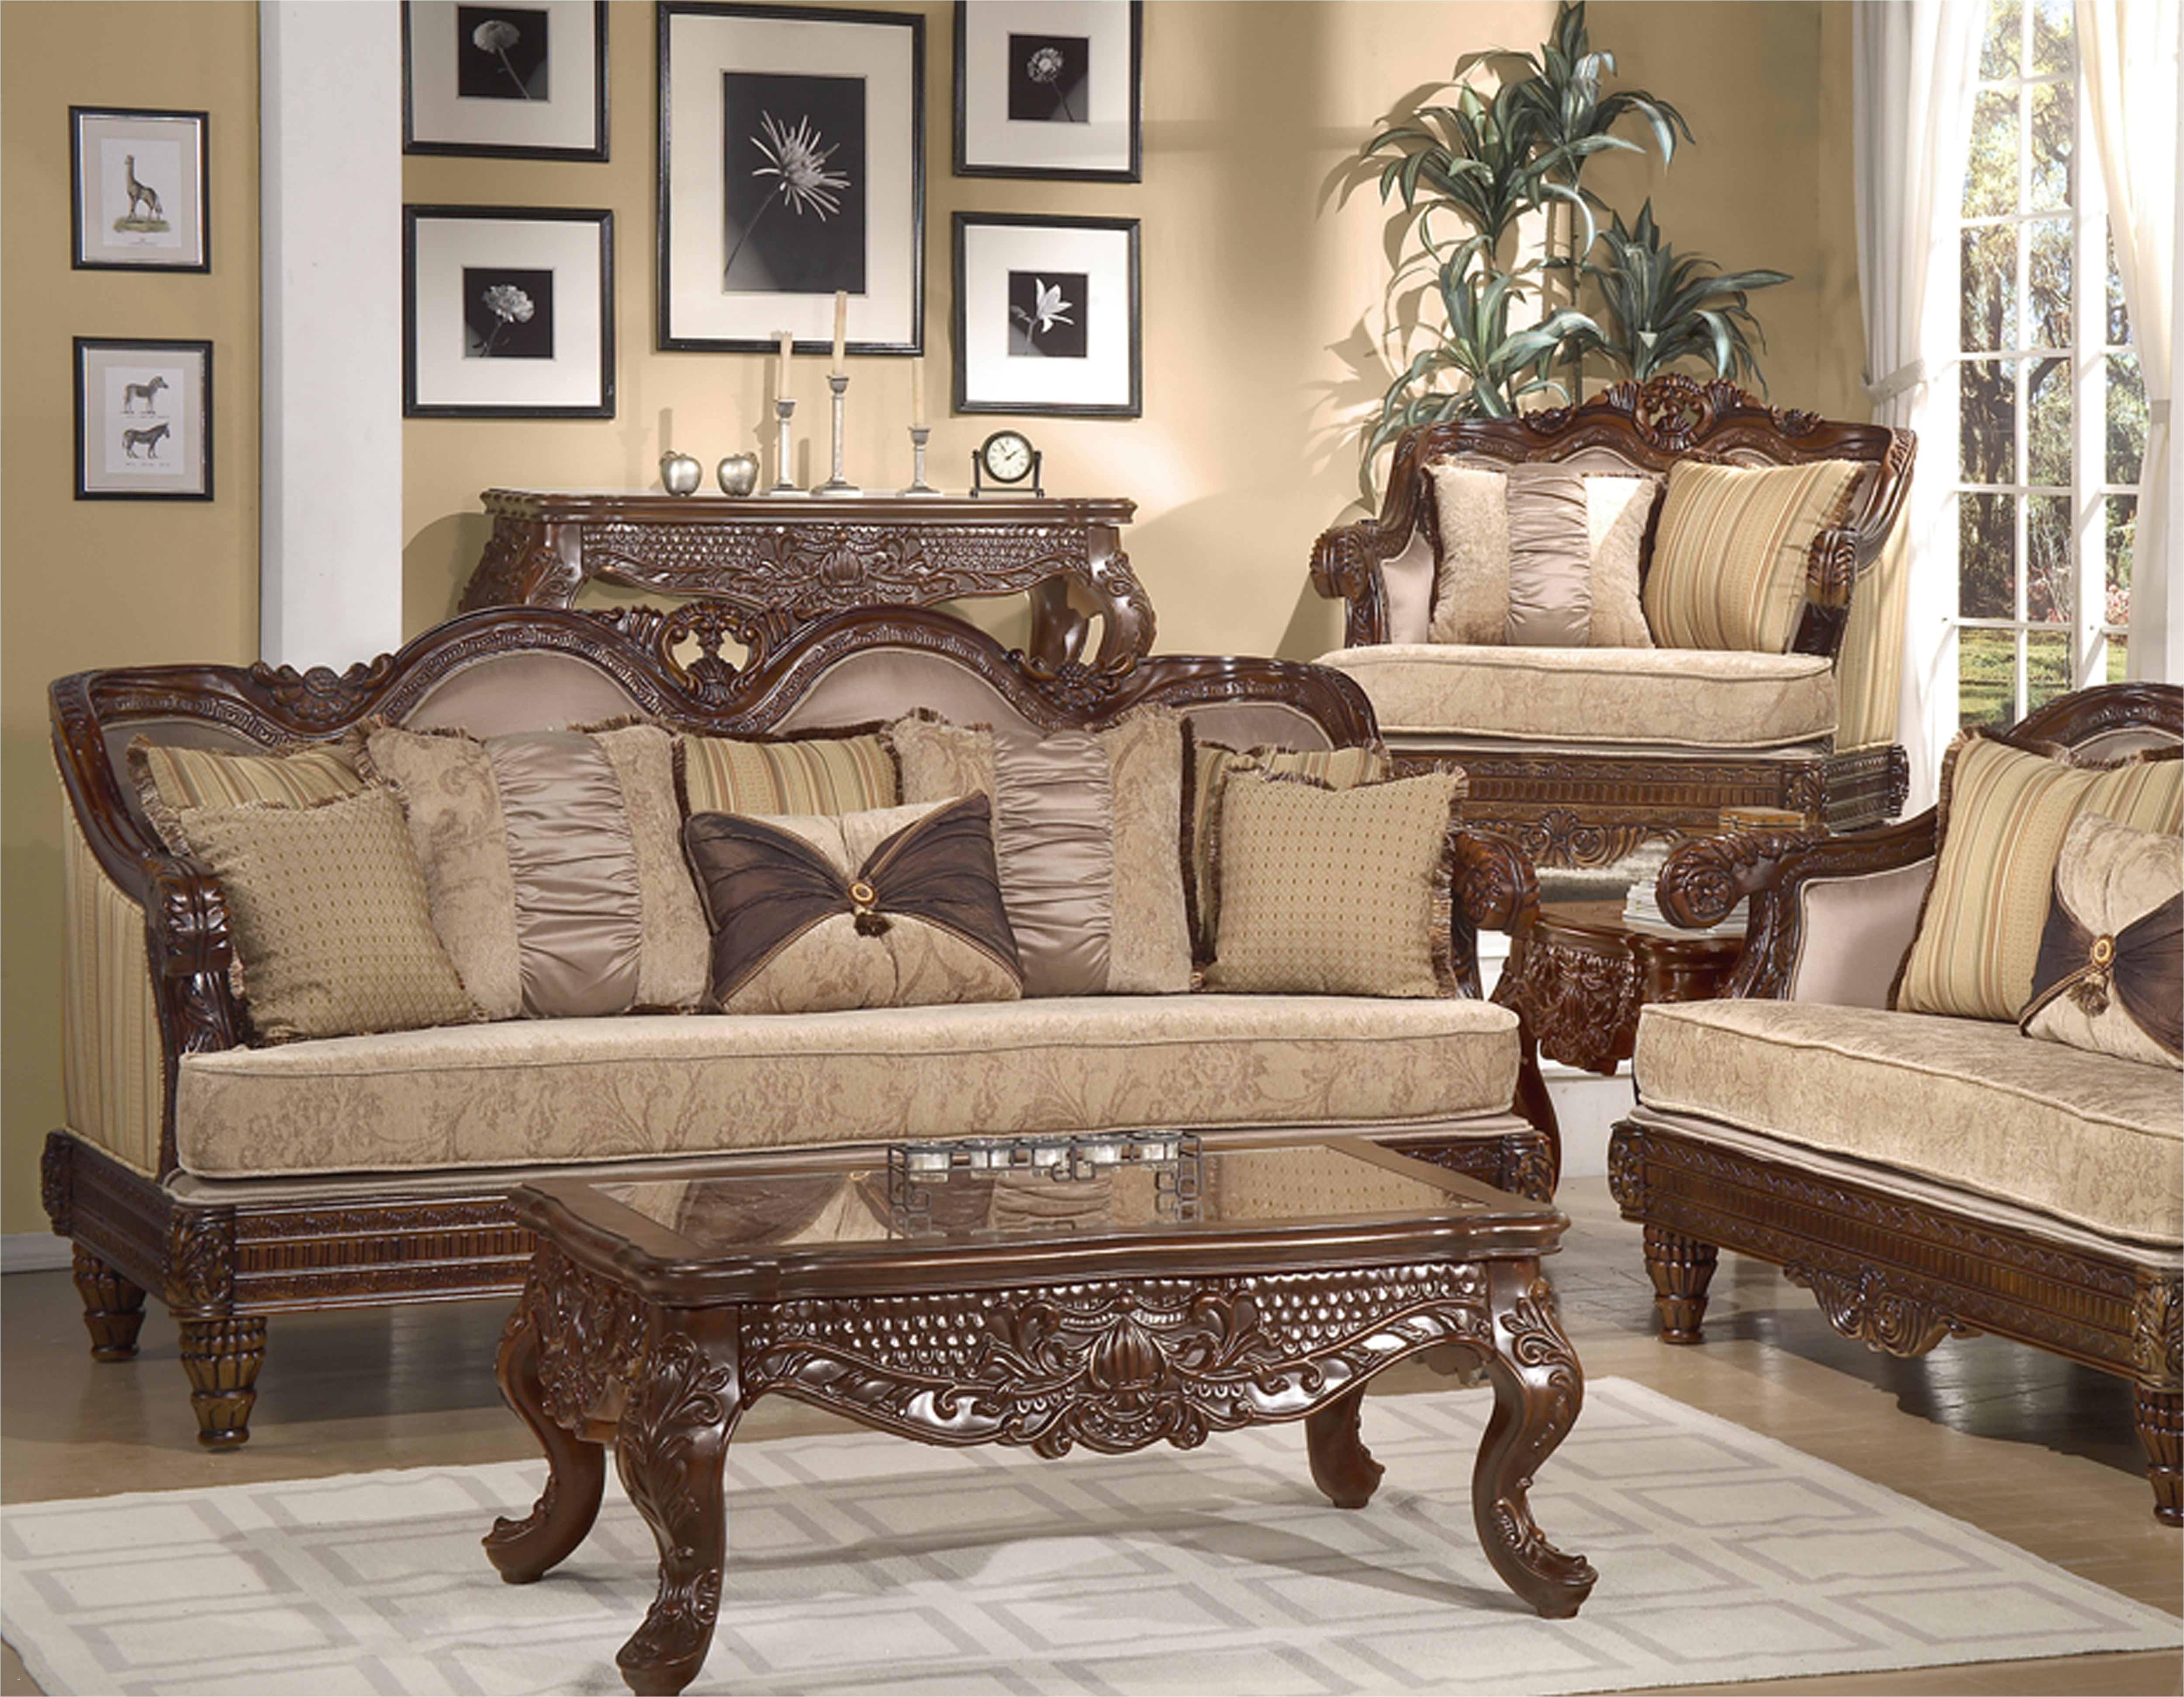 macys outdoor furniture elegant modern sofa set unique sofa big gunstige sofa macys furniture 0d